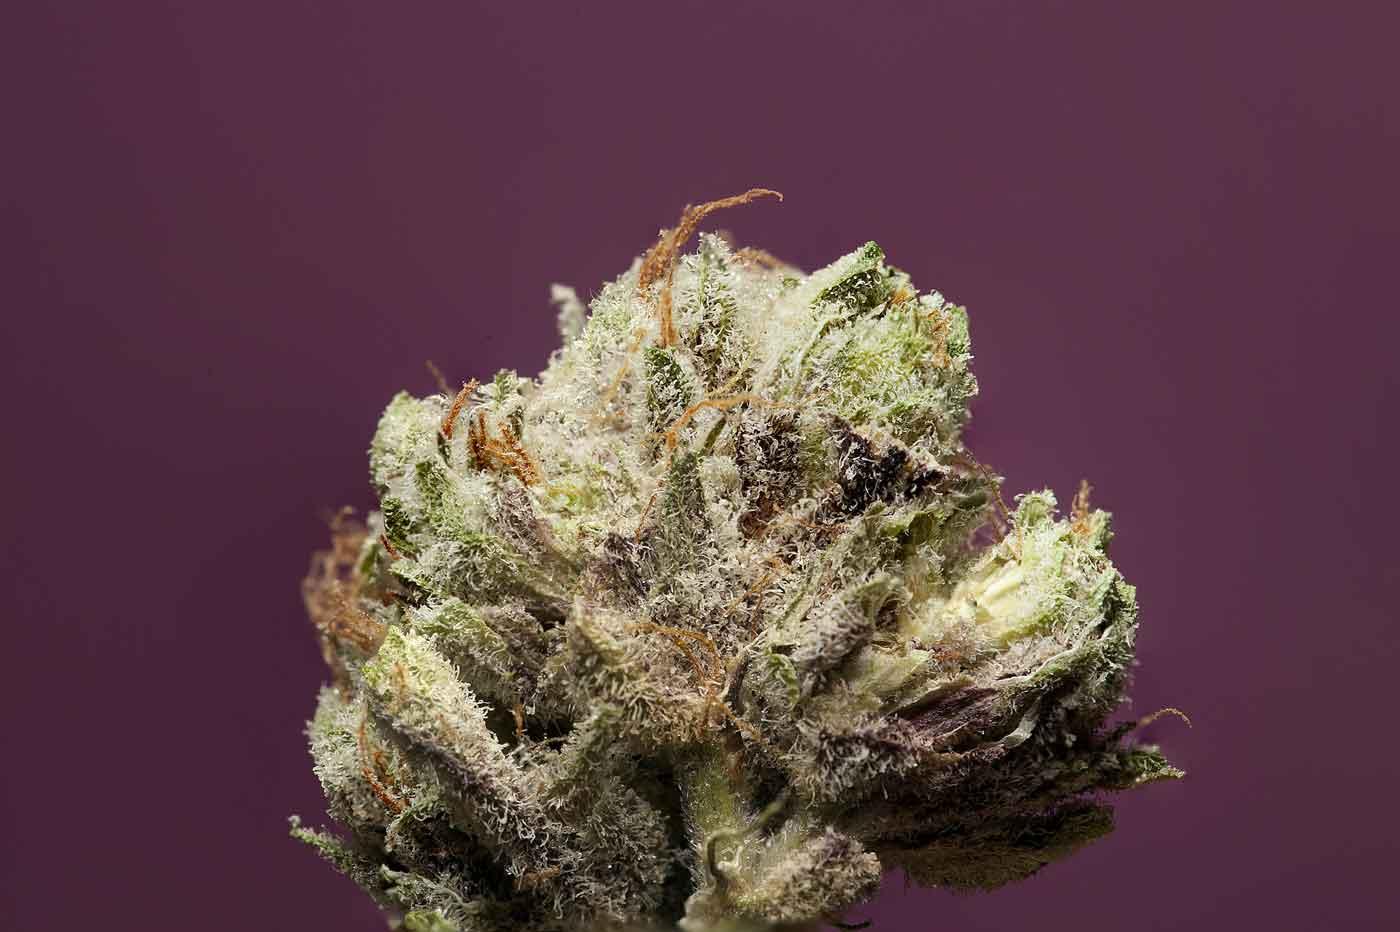 Trichomes - Cannabis 101 for Retail